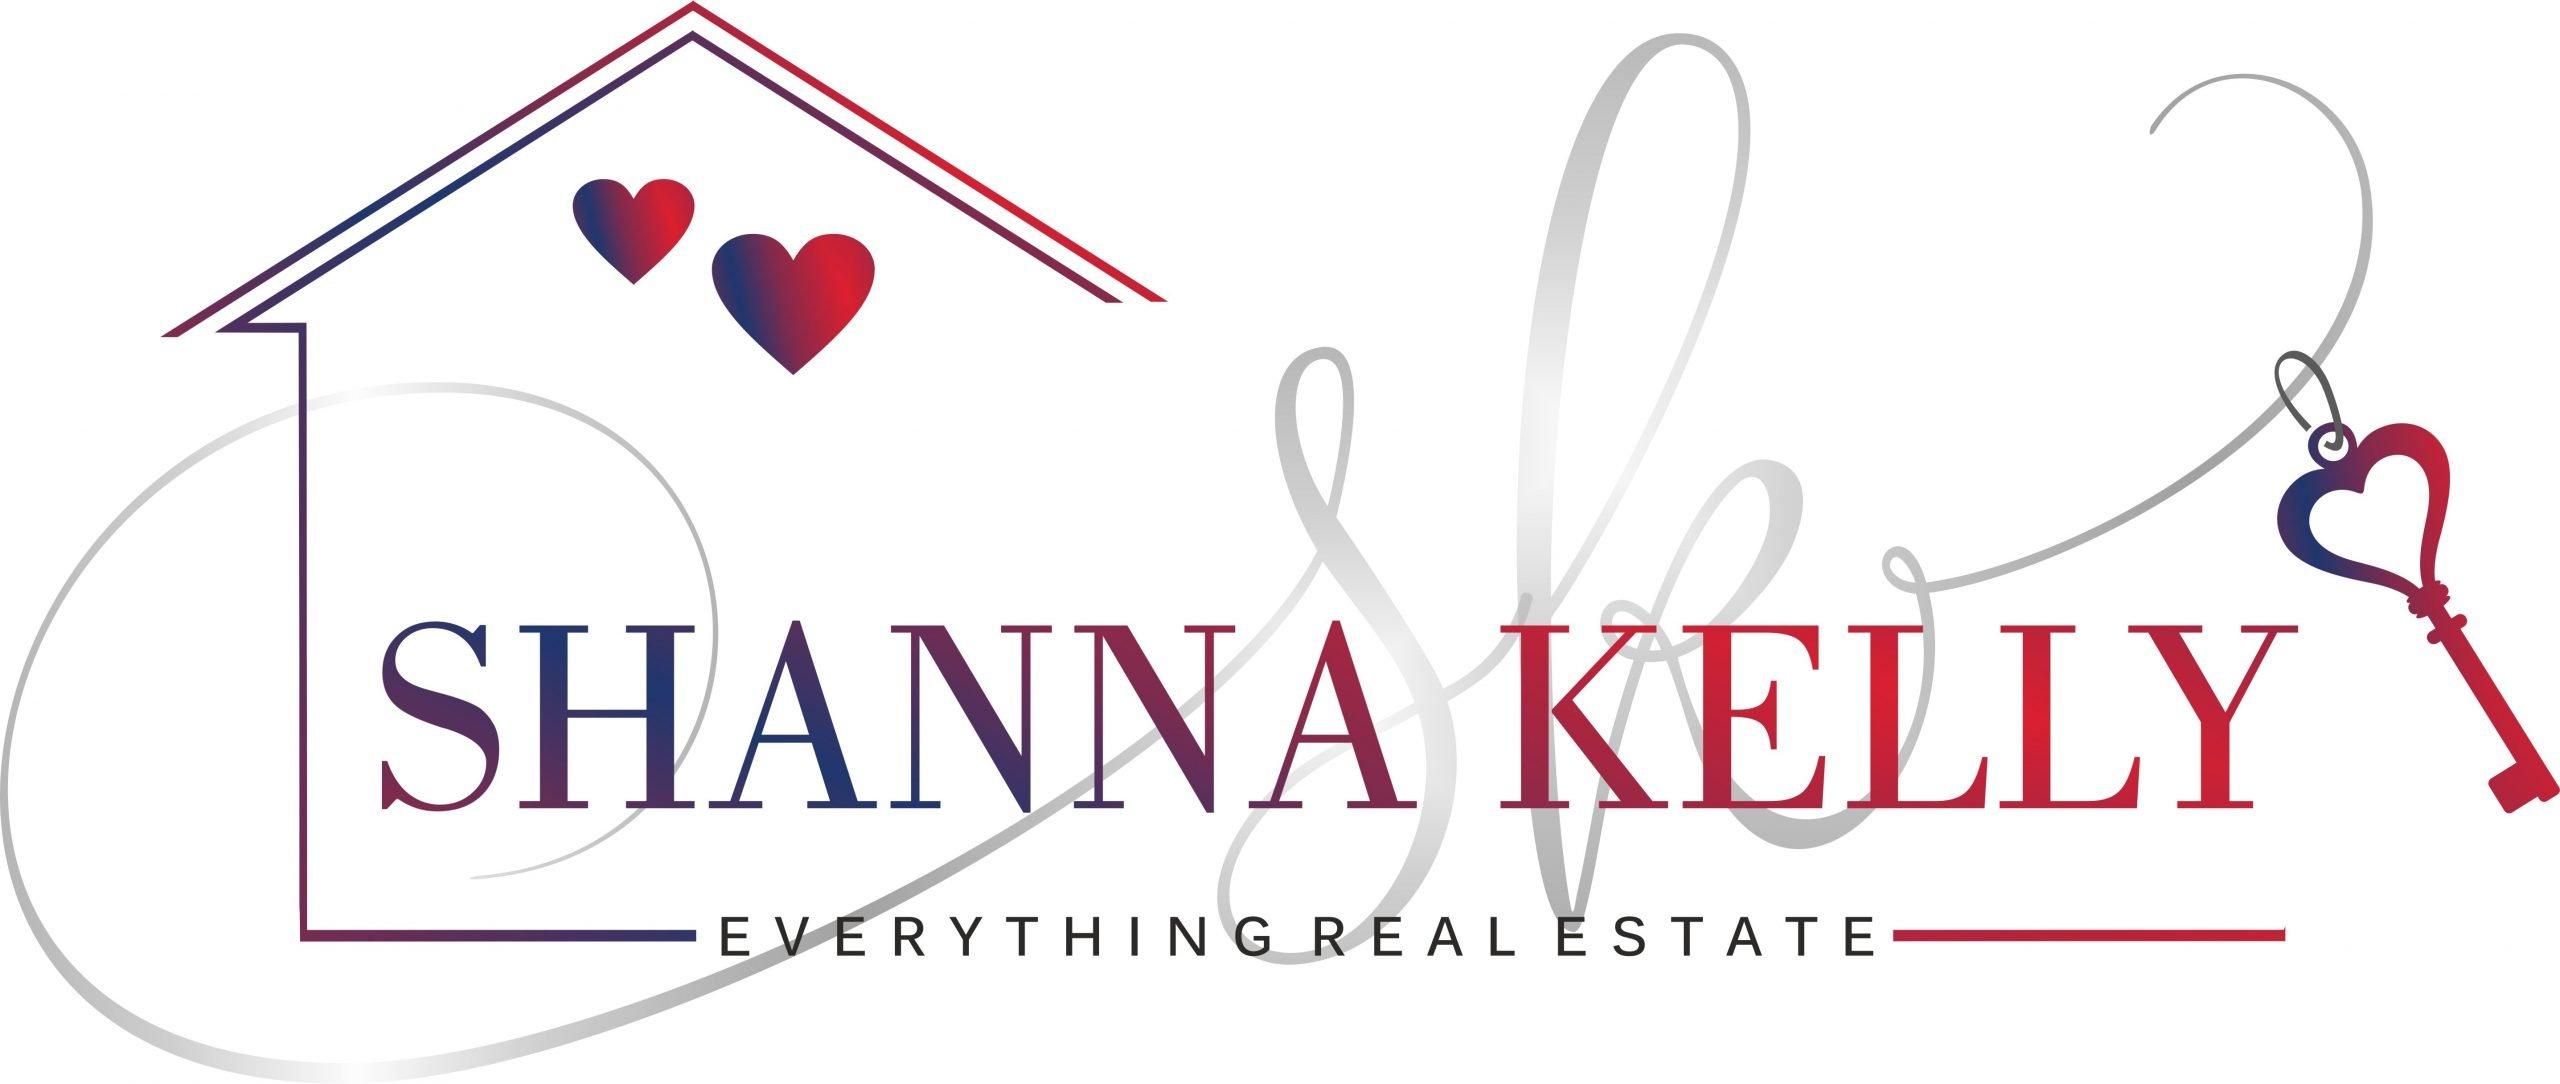 Shanna Kelly - Houses for Sale